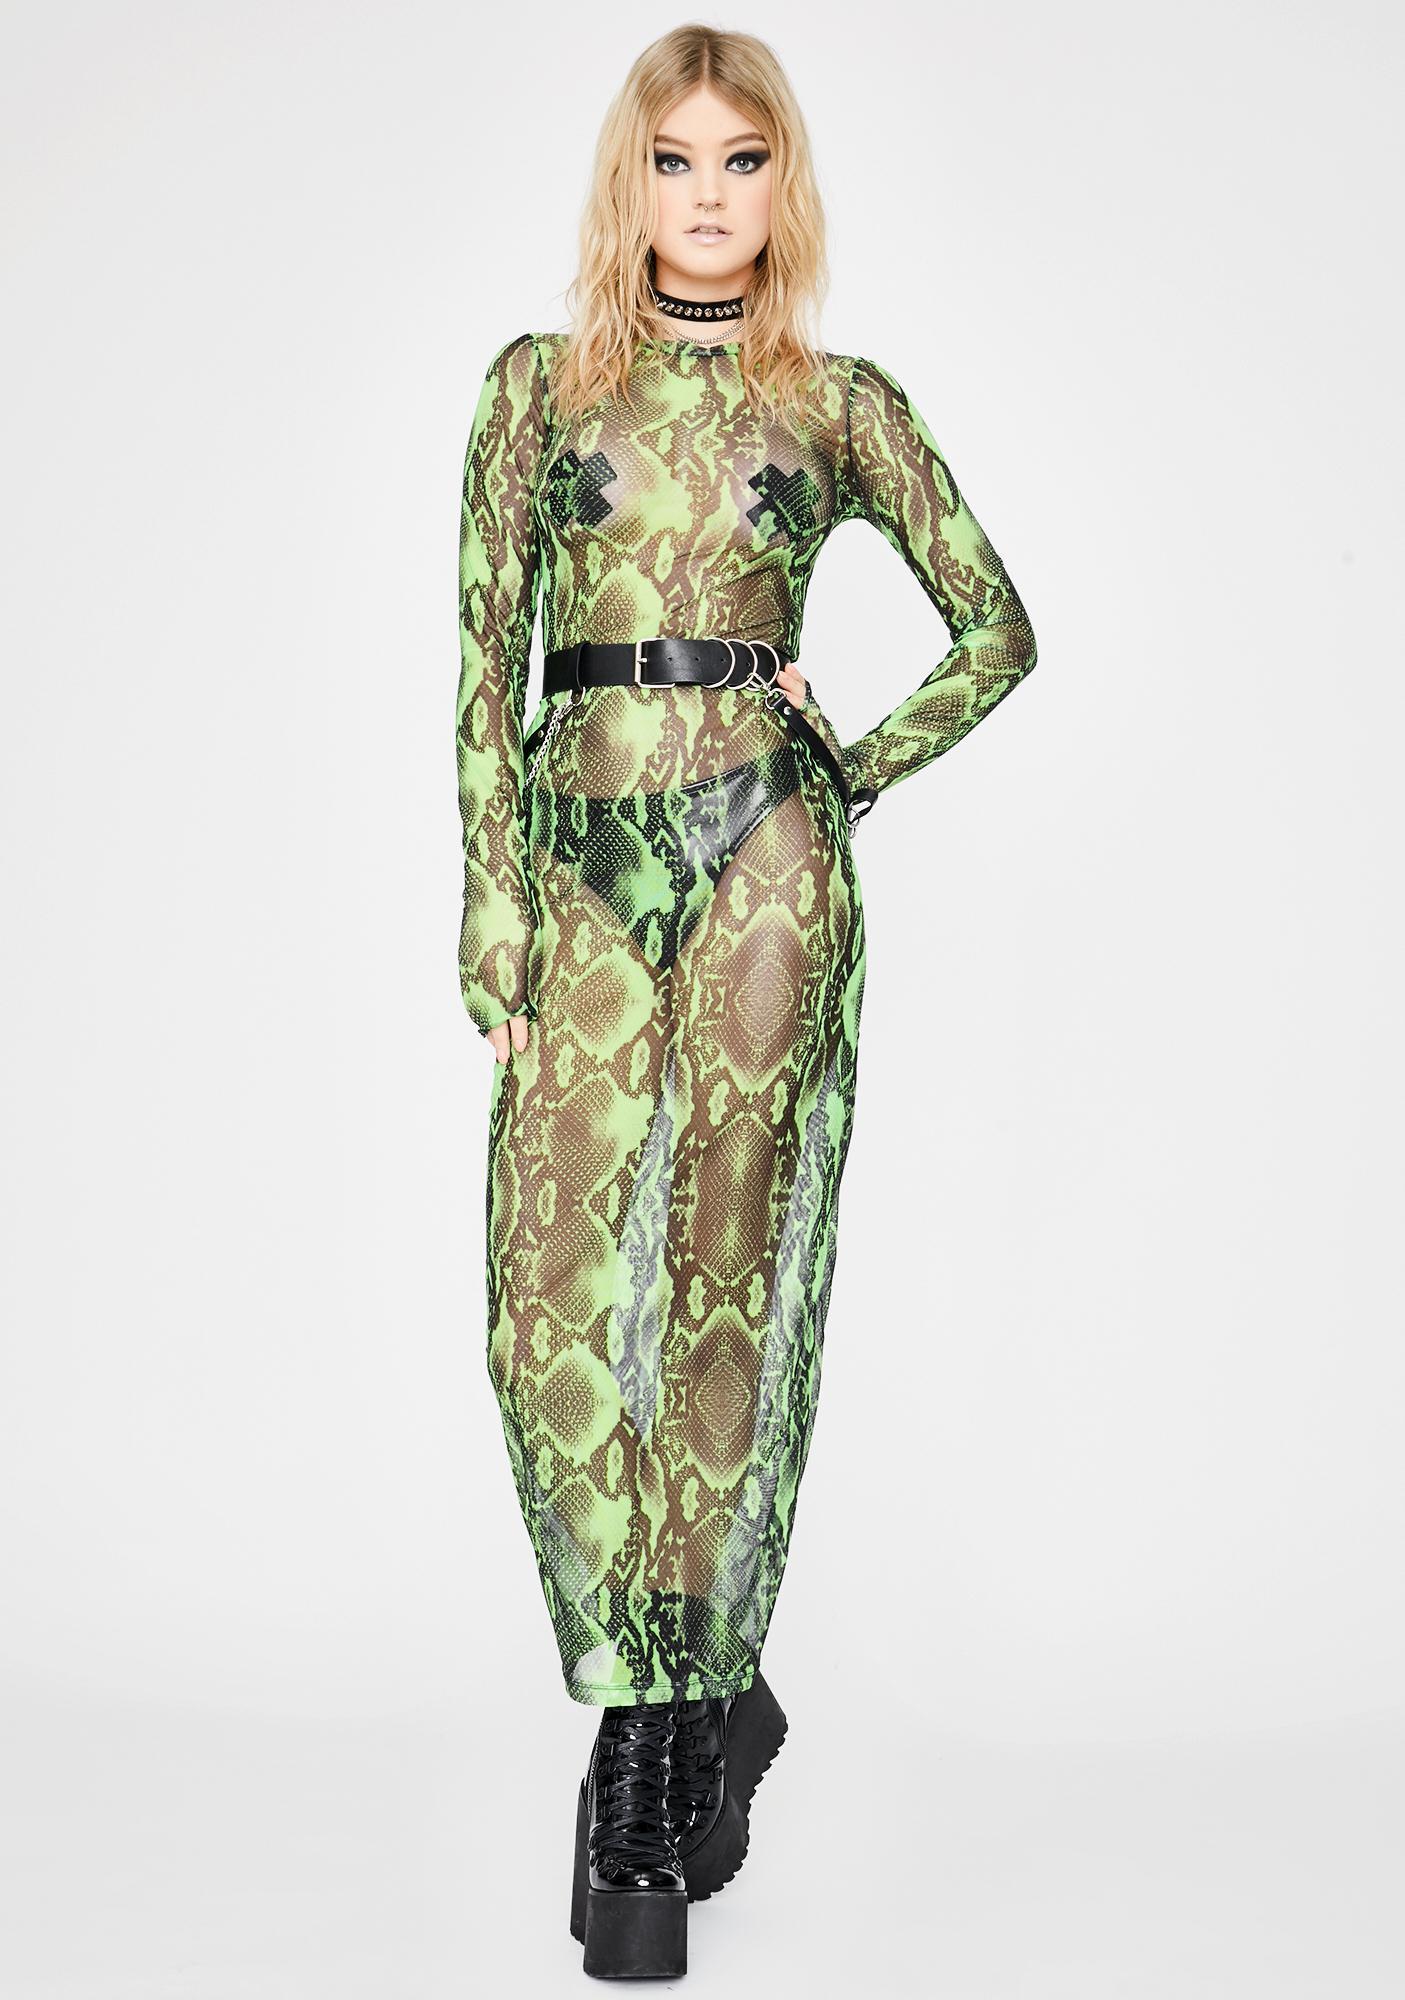 Ivy Berlin Anaconda Mesh Dress